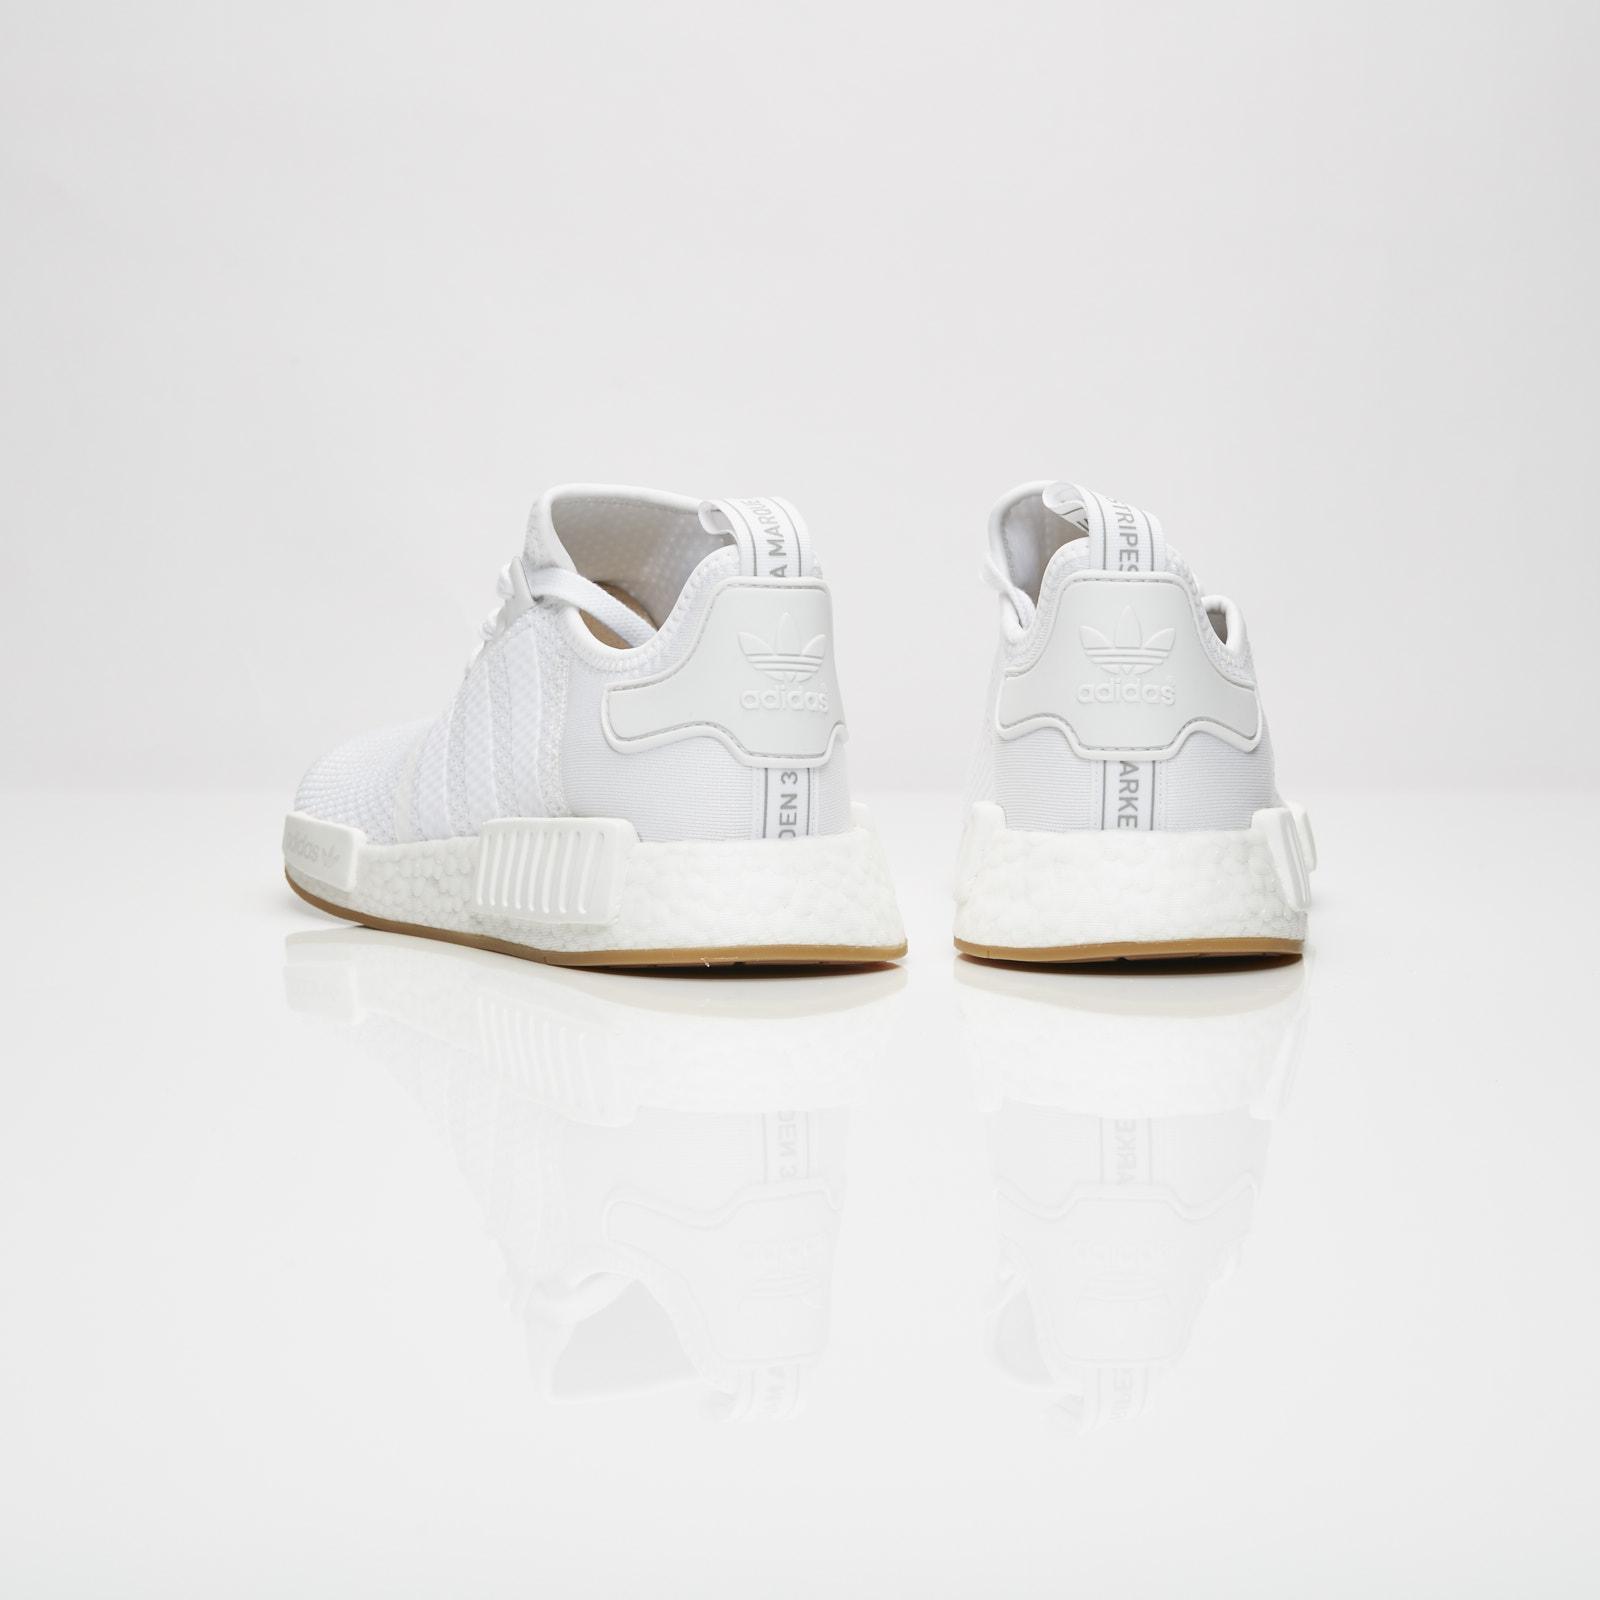 a18b30140 adidas NMD R1 - D96635 - Sneakersnstuff